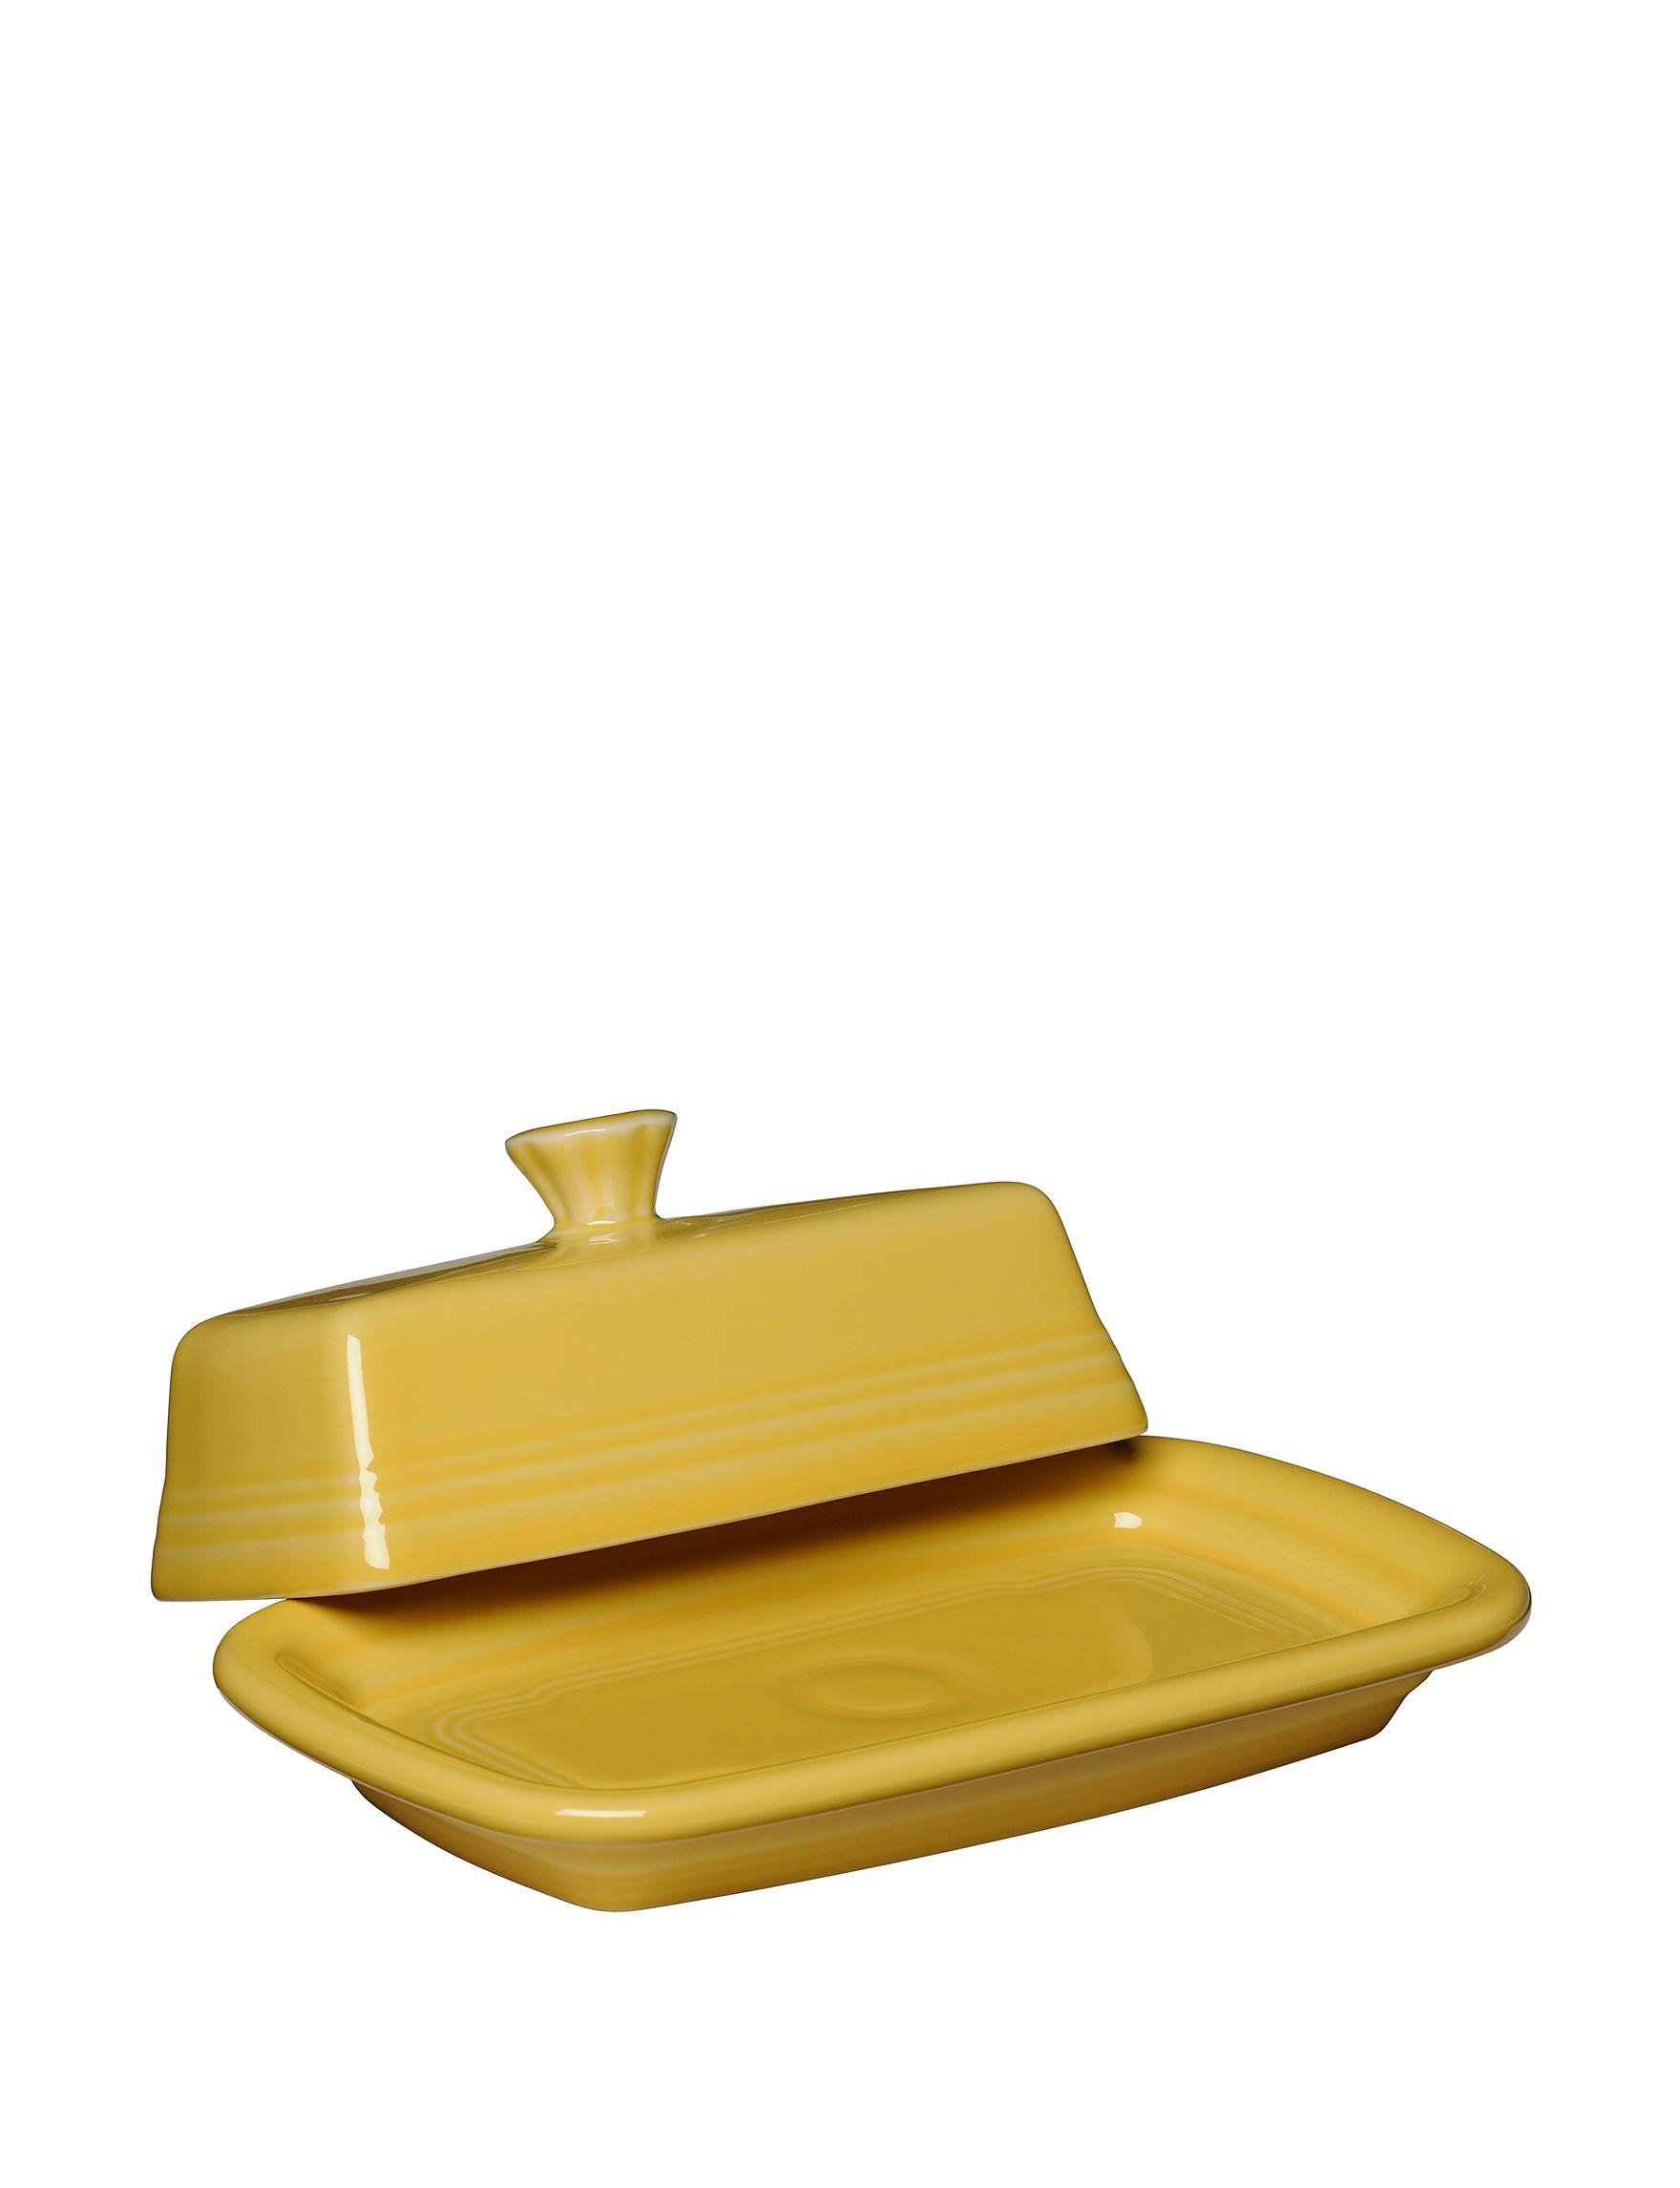 Fiesta Sunflower Serving Platters & Trays Serveware